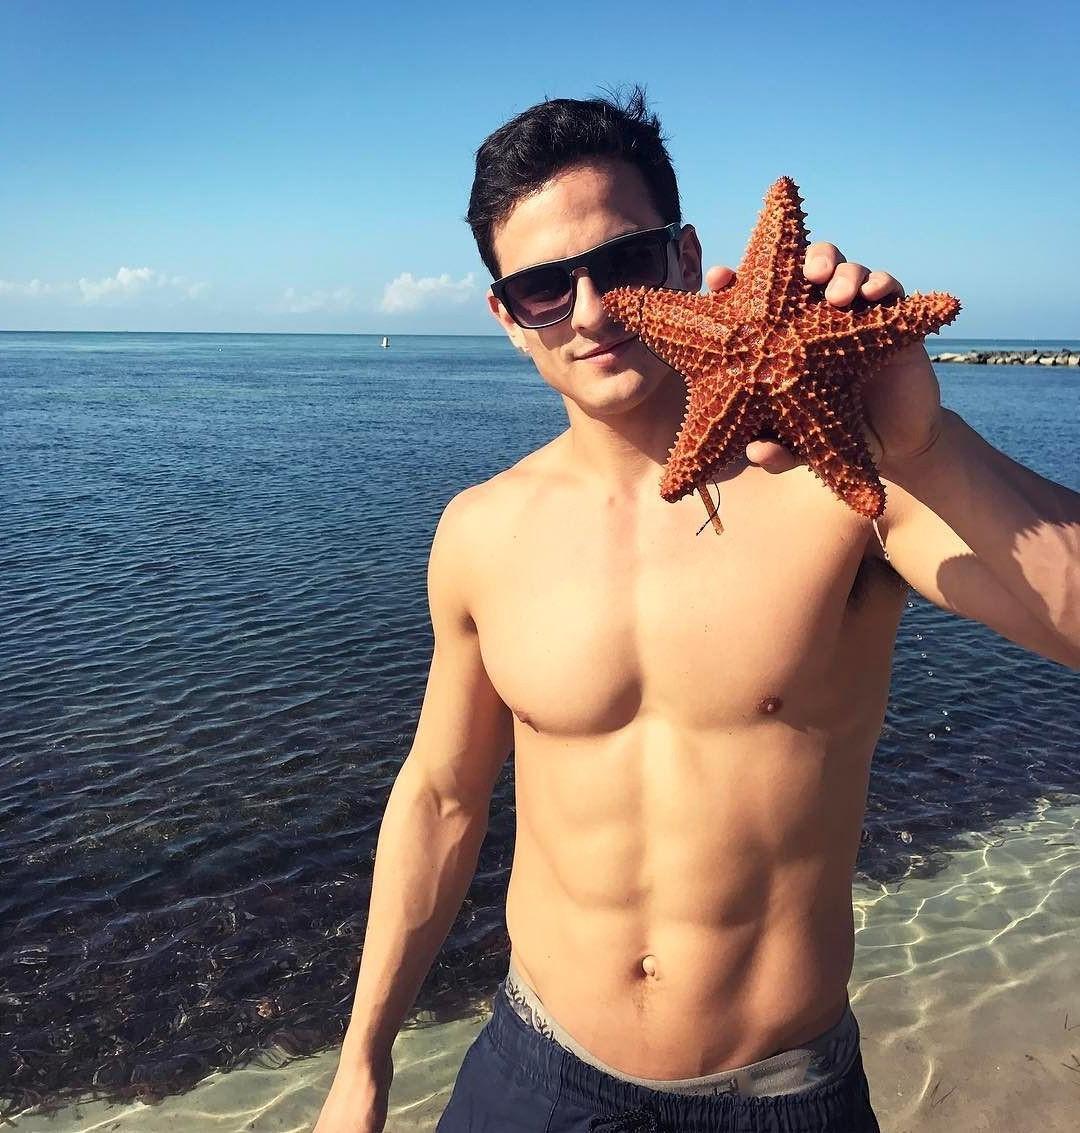 hot-shirtless-guy-sunglasses-real-beautiful-sea-star